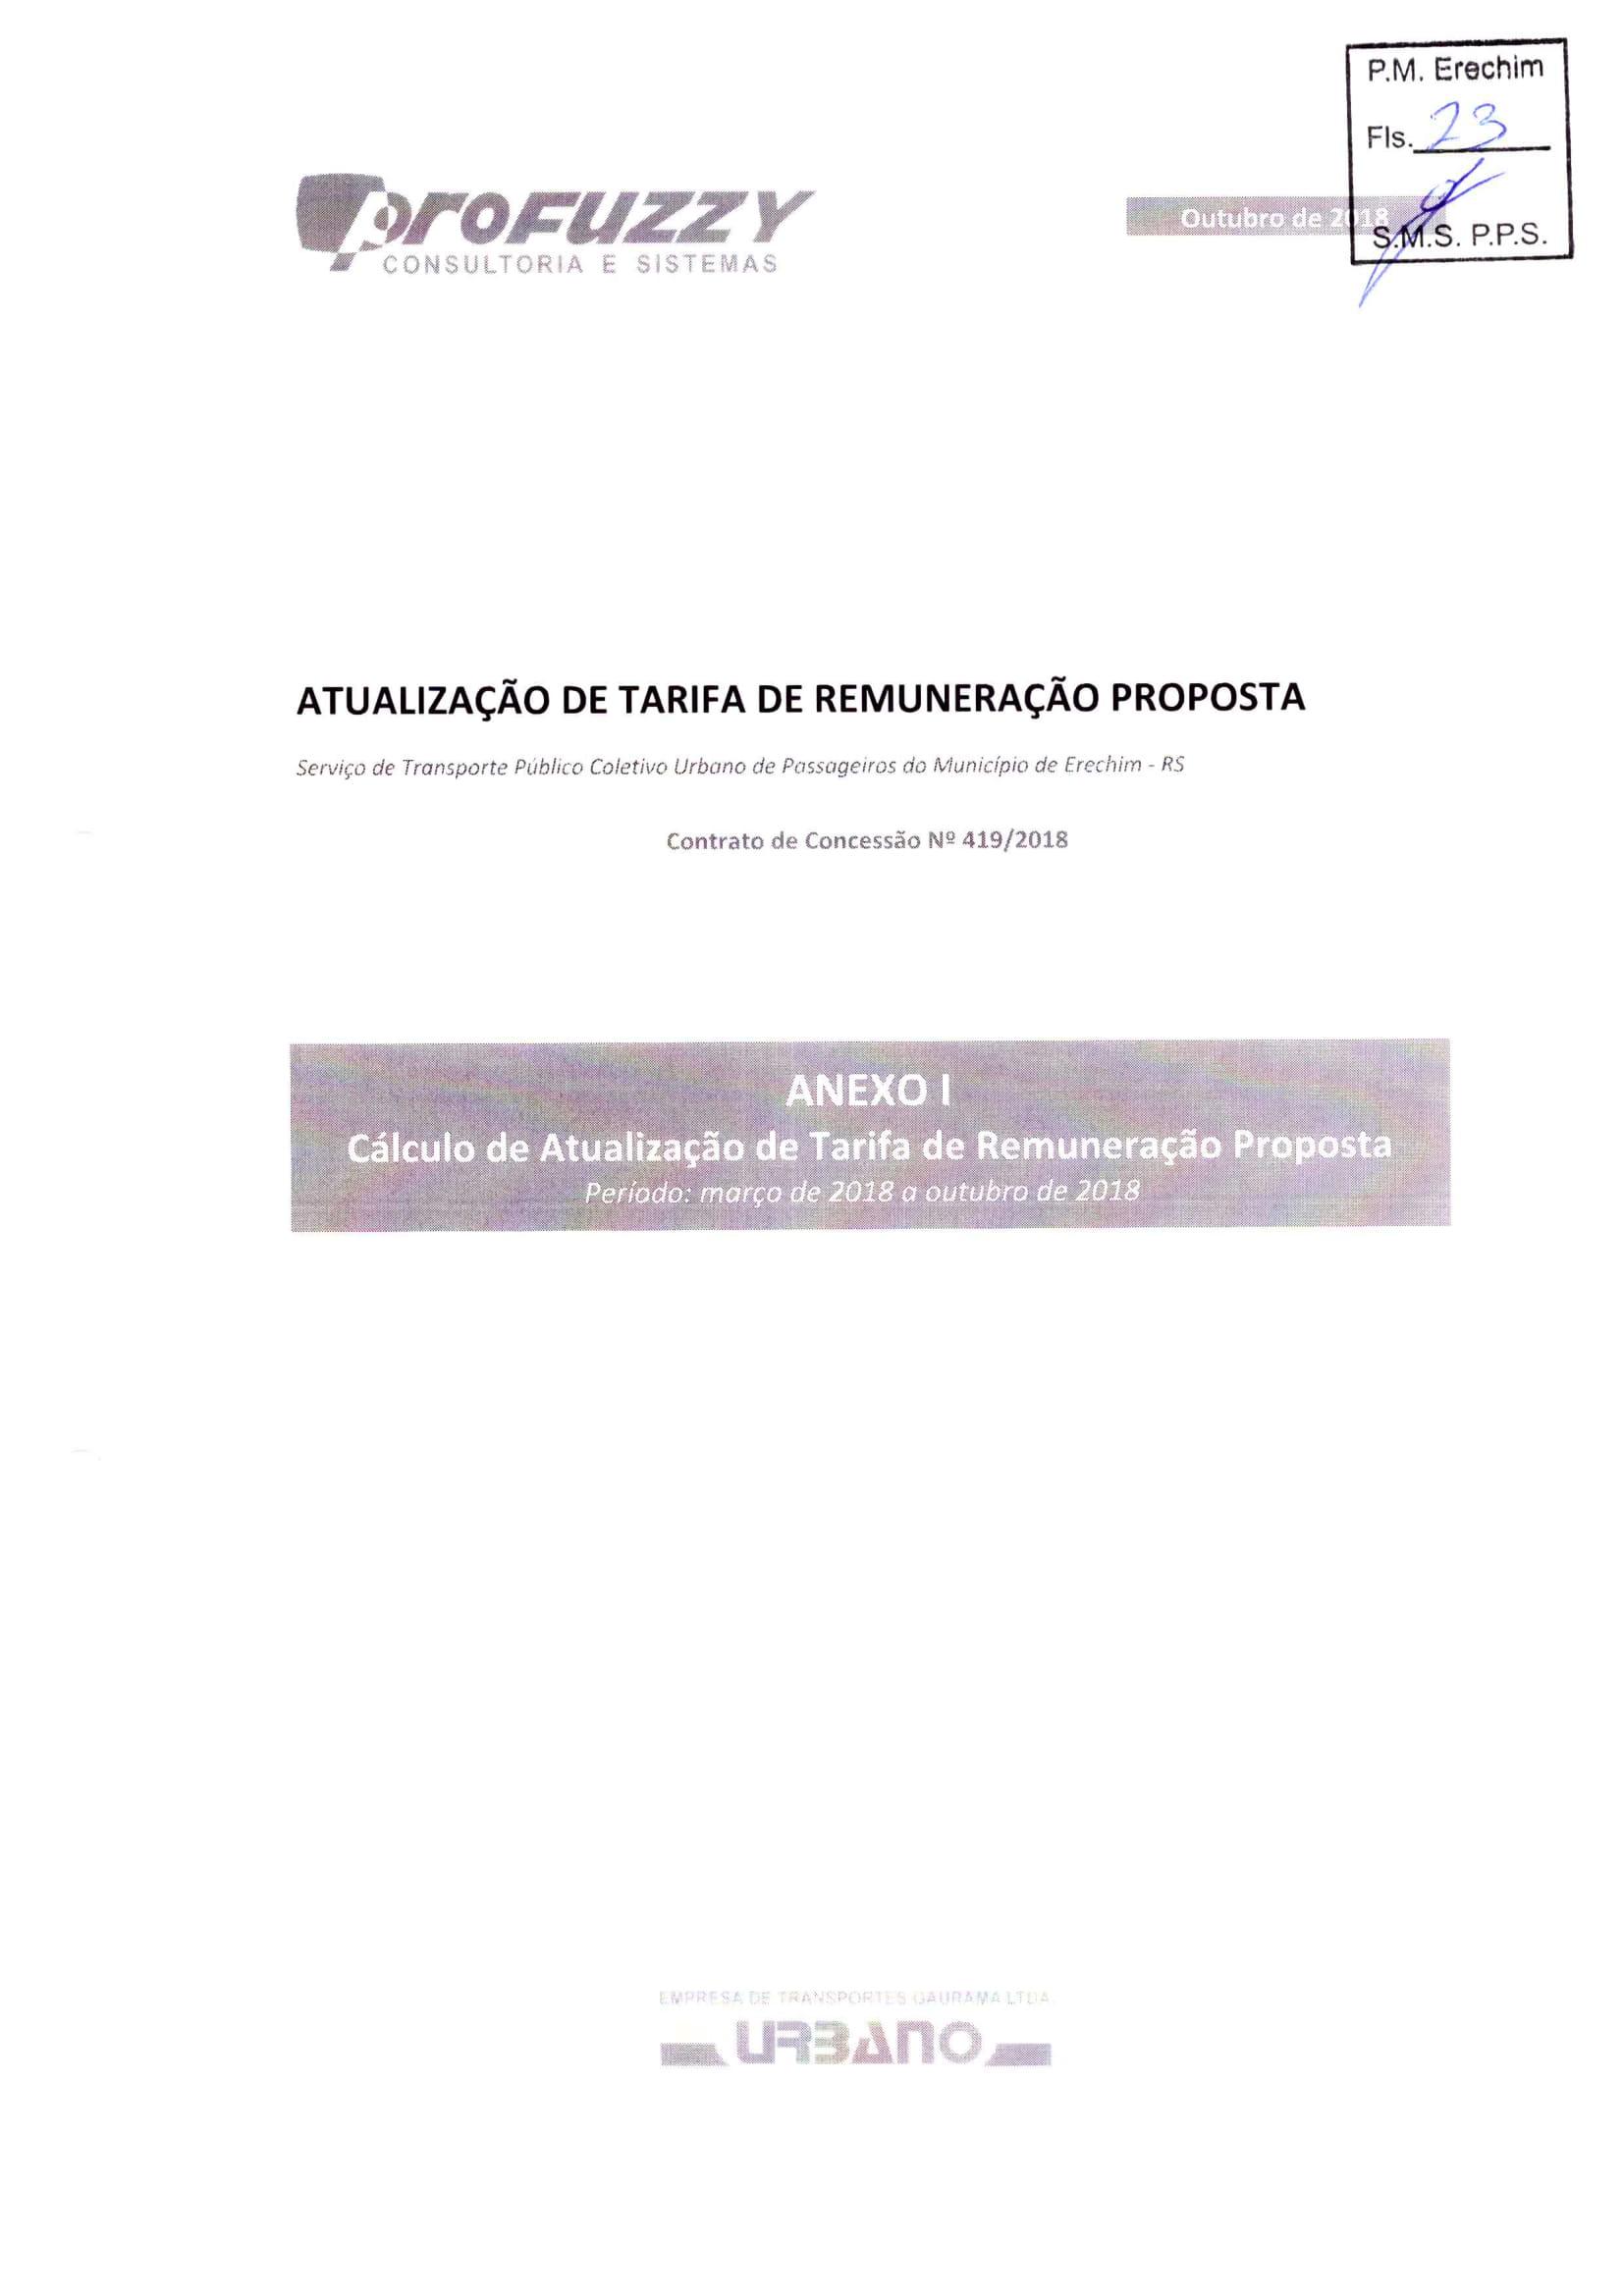 Tarifas - Atualizacao-01